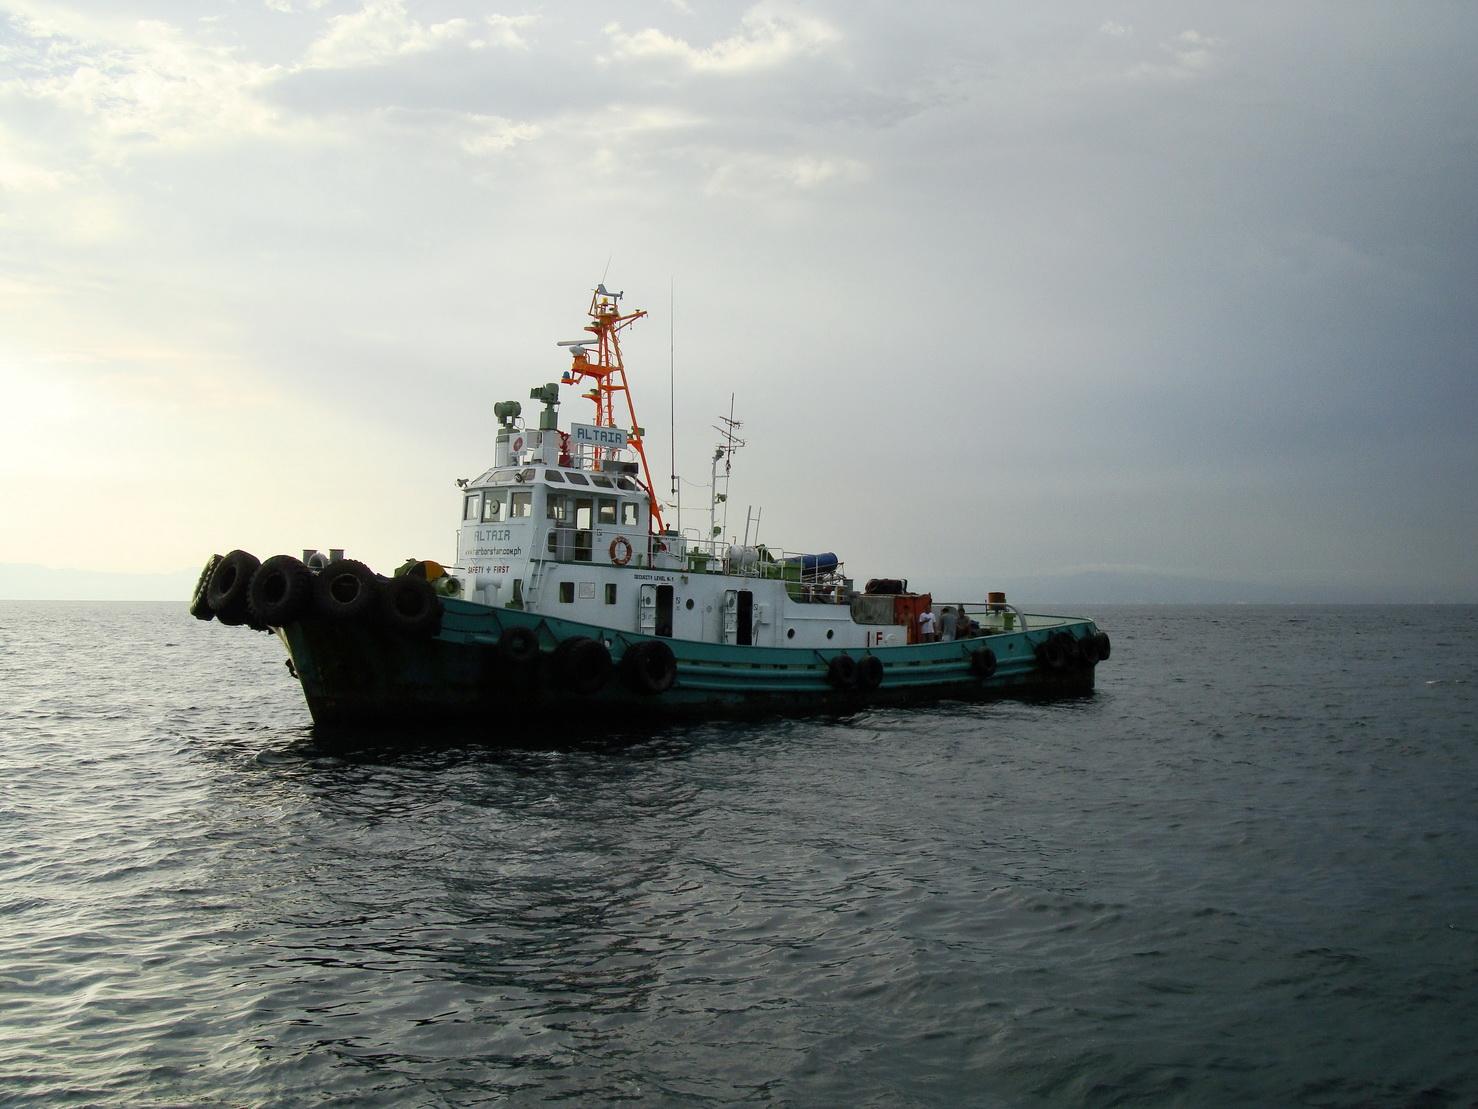 Tugboat Altair wwwharborstarcomph Batangus Philippines 01